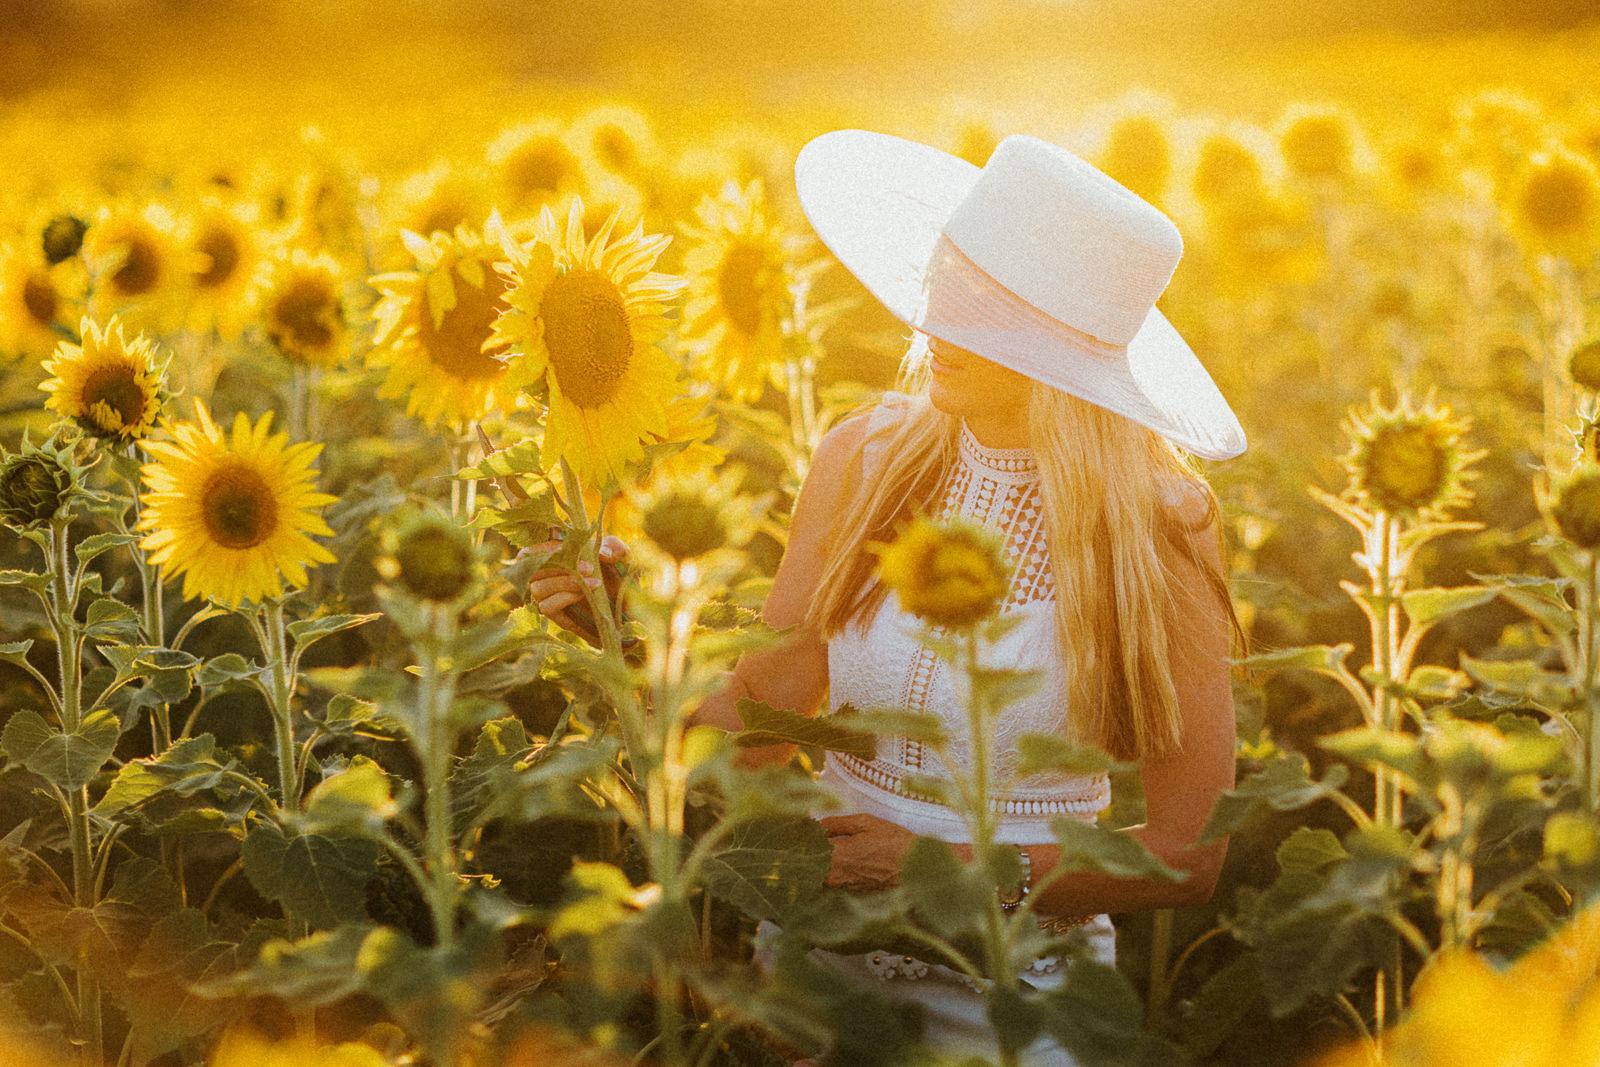 sunflowerfield at sunset